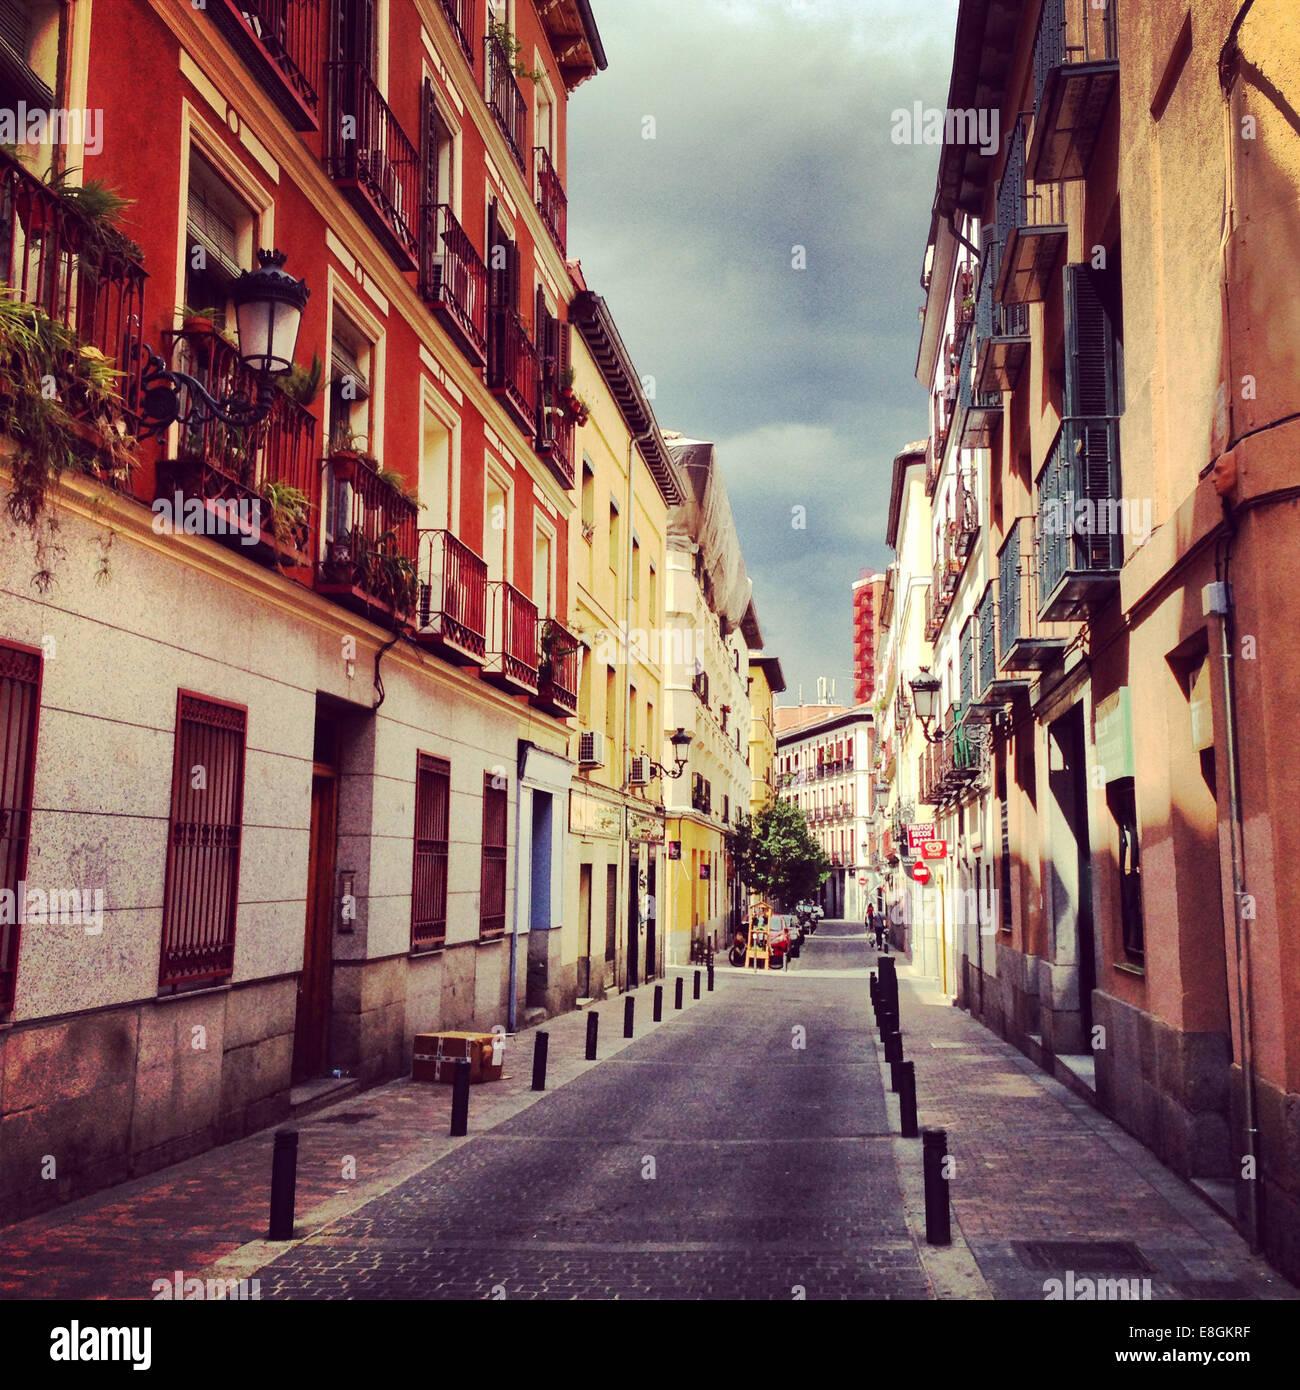 Spain, Madrid, Barrio de las Letras, Little street - Stock Image